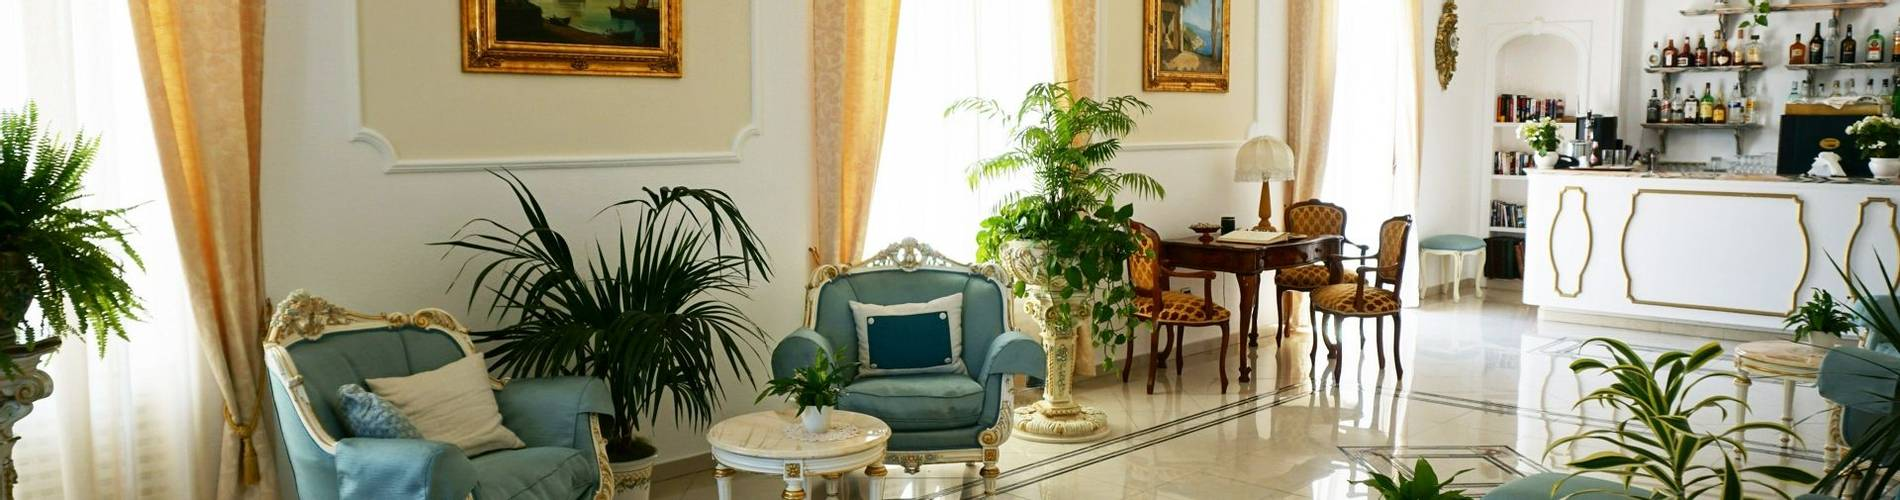 Villa Garden, Amalfi, Italy (6).jpg